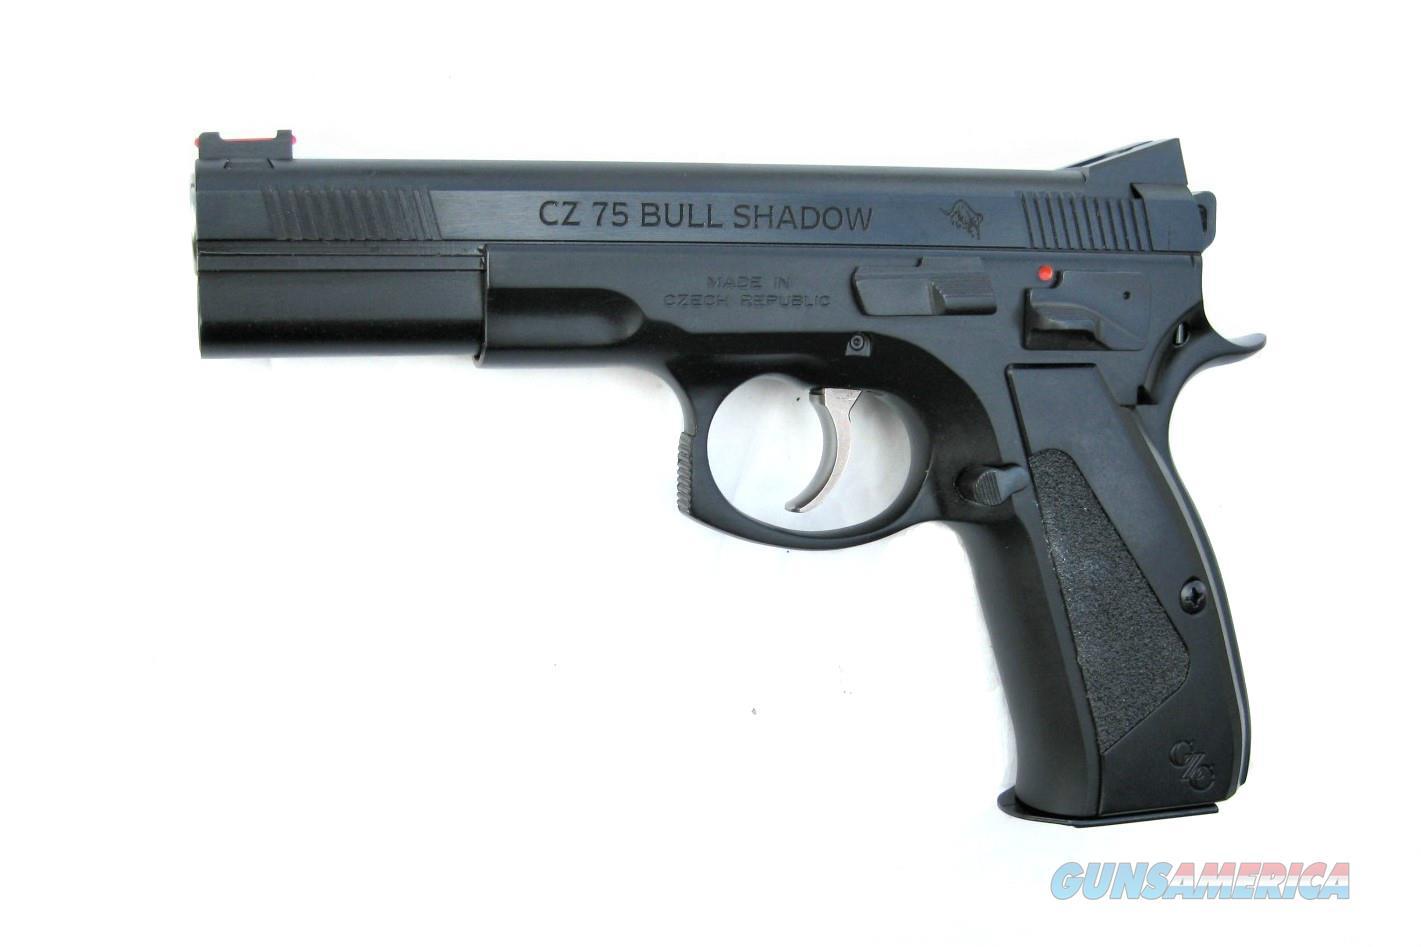 CZ 75 Bull Shadow Custom 9mm CZC Bull Barrel 91726  *NEW*  Guns > Pistols > CZ Pistols